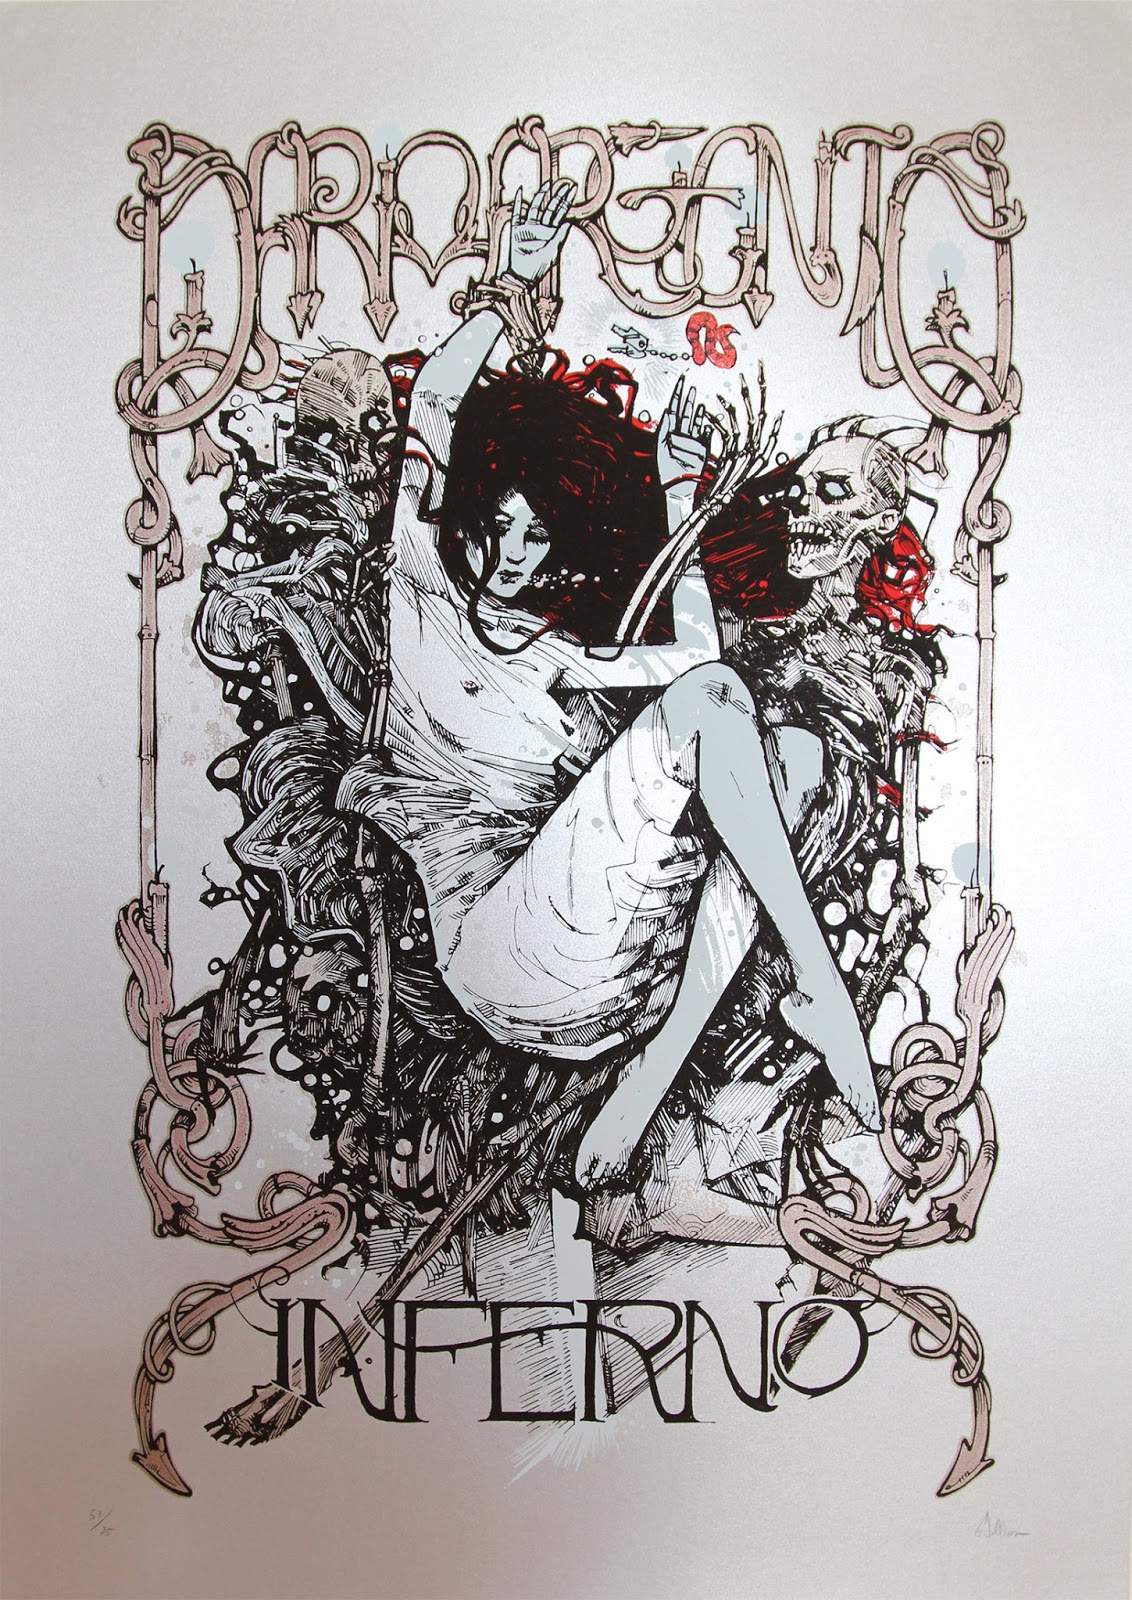 http://4.bp.blogspot.com/-7sGvyTOToyY/UOpvPCivwaI/AAAAAAAAvB0/t7Cde5rA_ws/s1600/Inferno-Variant-Malleus-movie-inside-the-rock-poster-frame.jpg